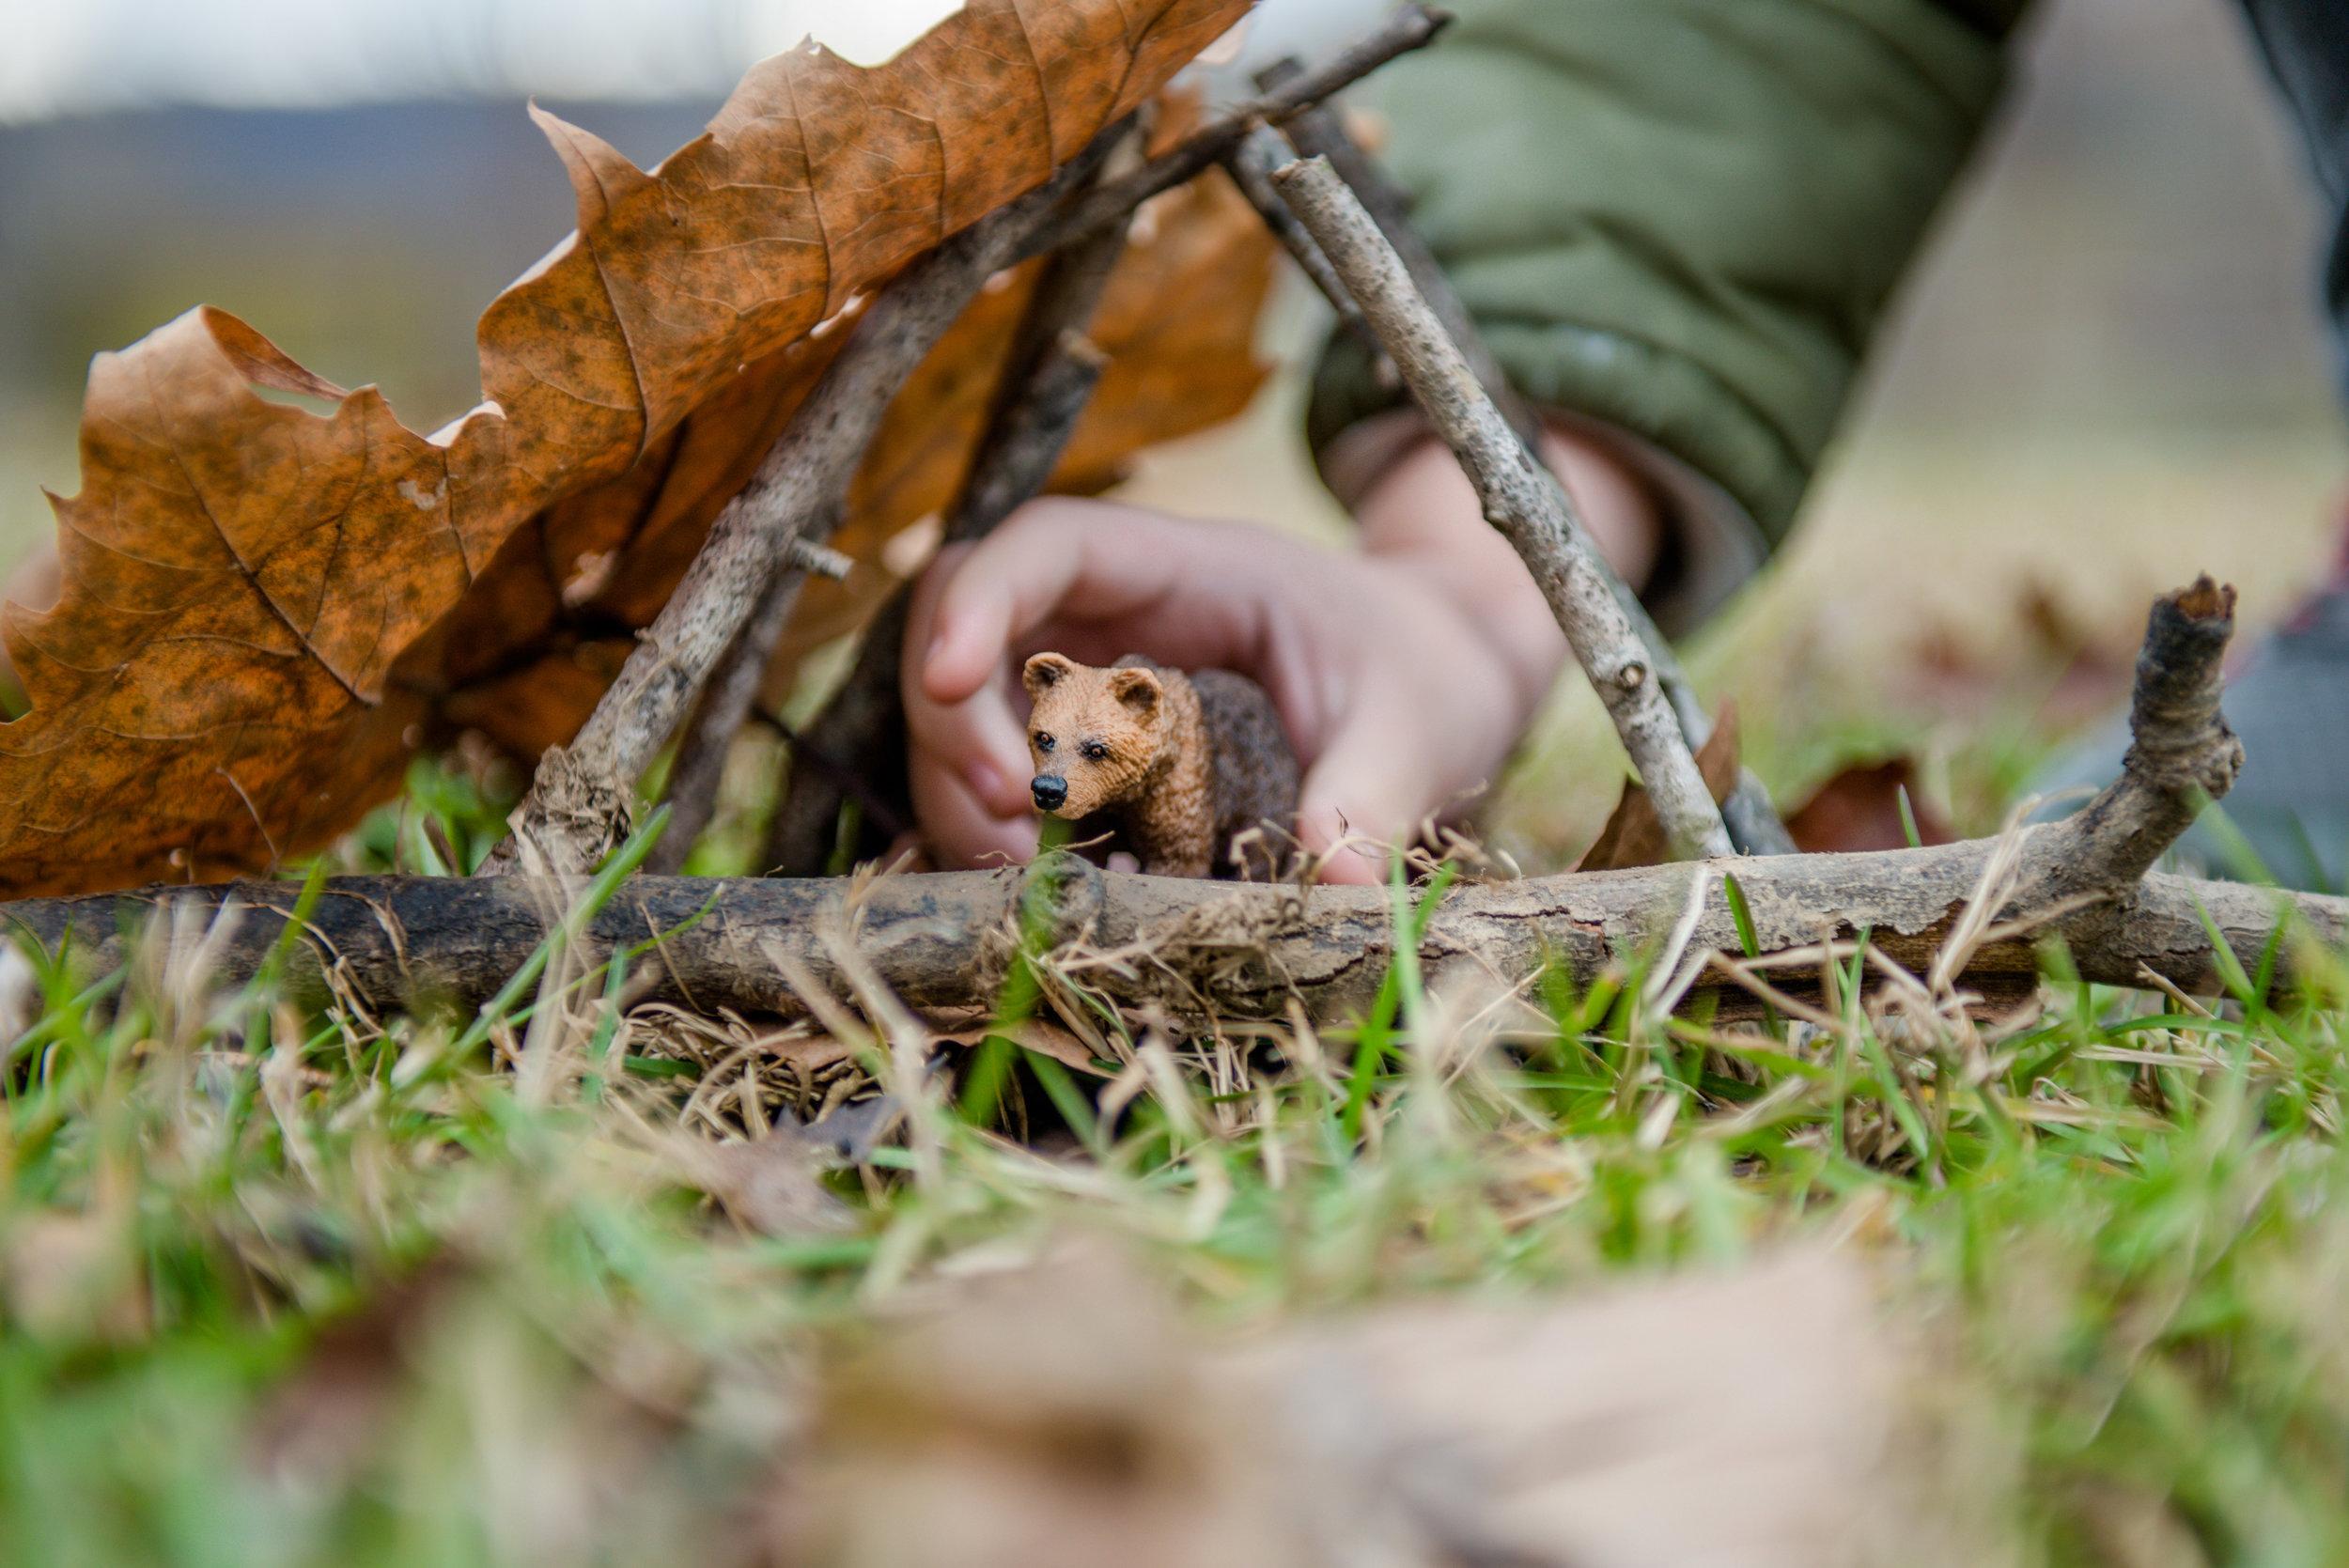 Den-building challenge, featured in the Wonderkin Winter Wildlife Box